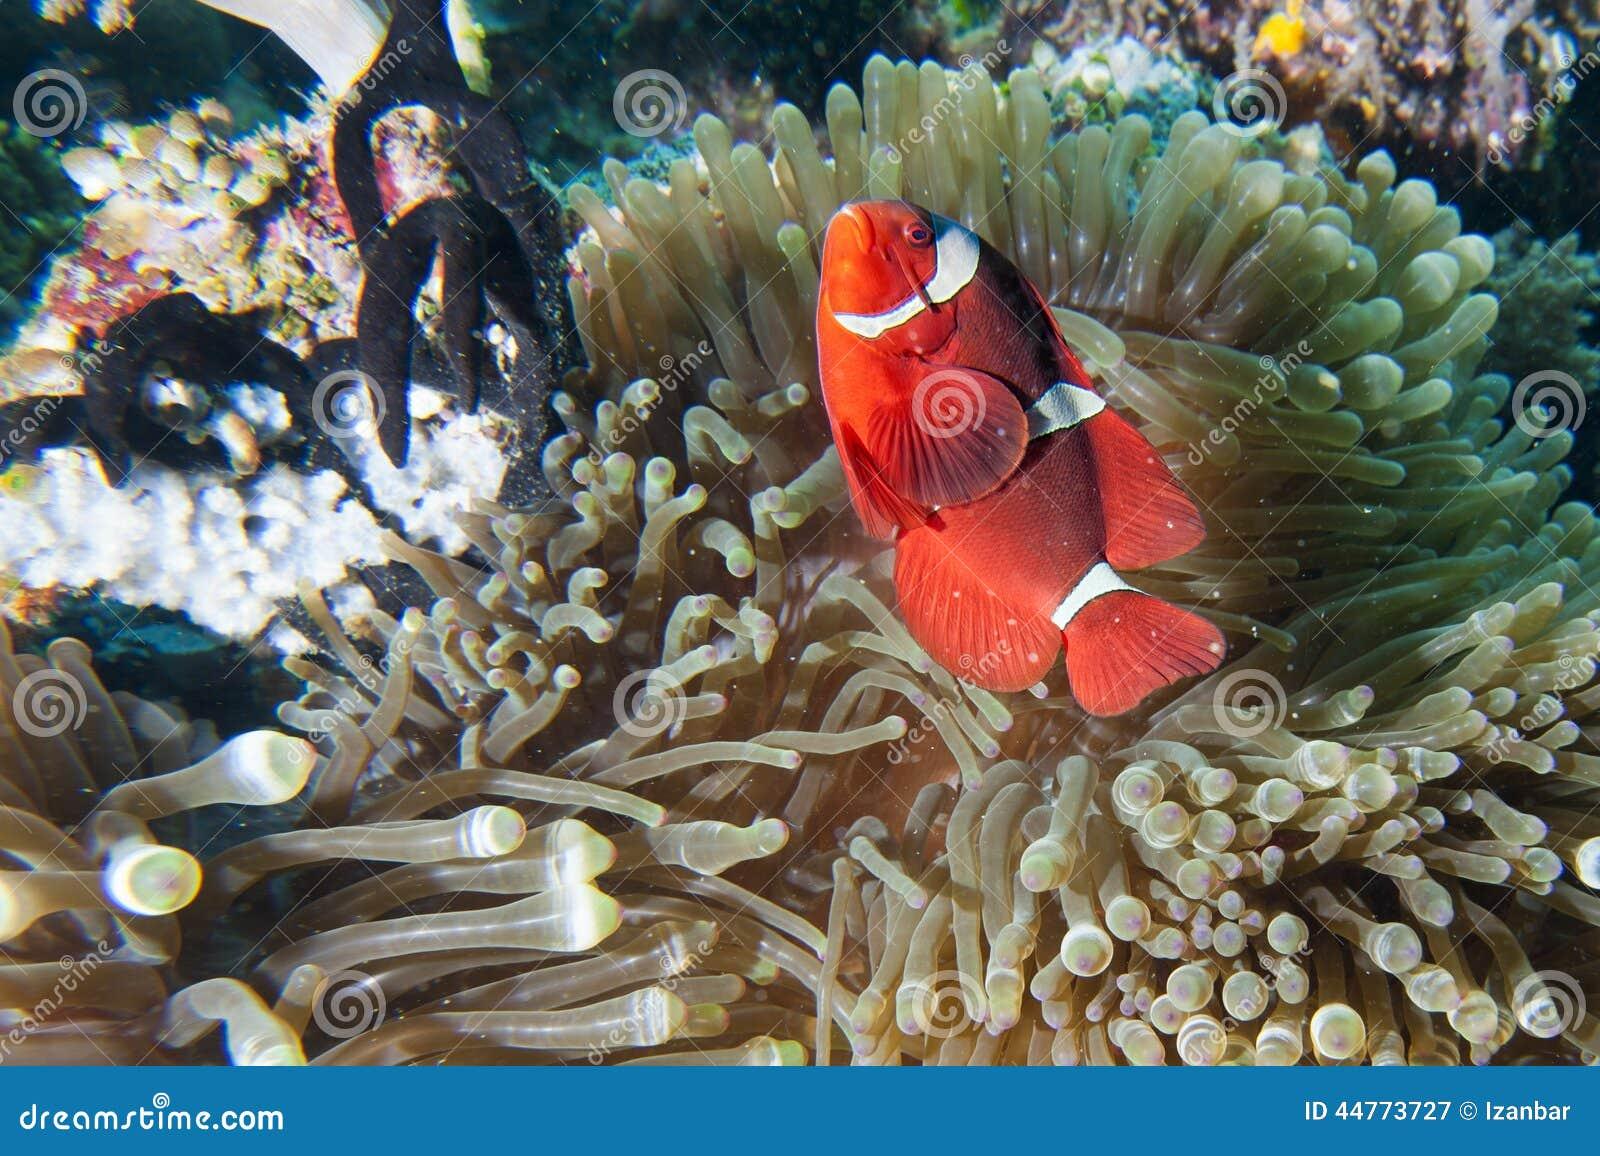 Red Clown fish in anemone Raja Ampat Papua